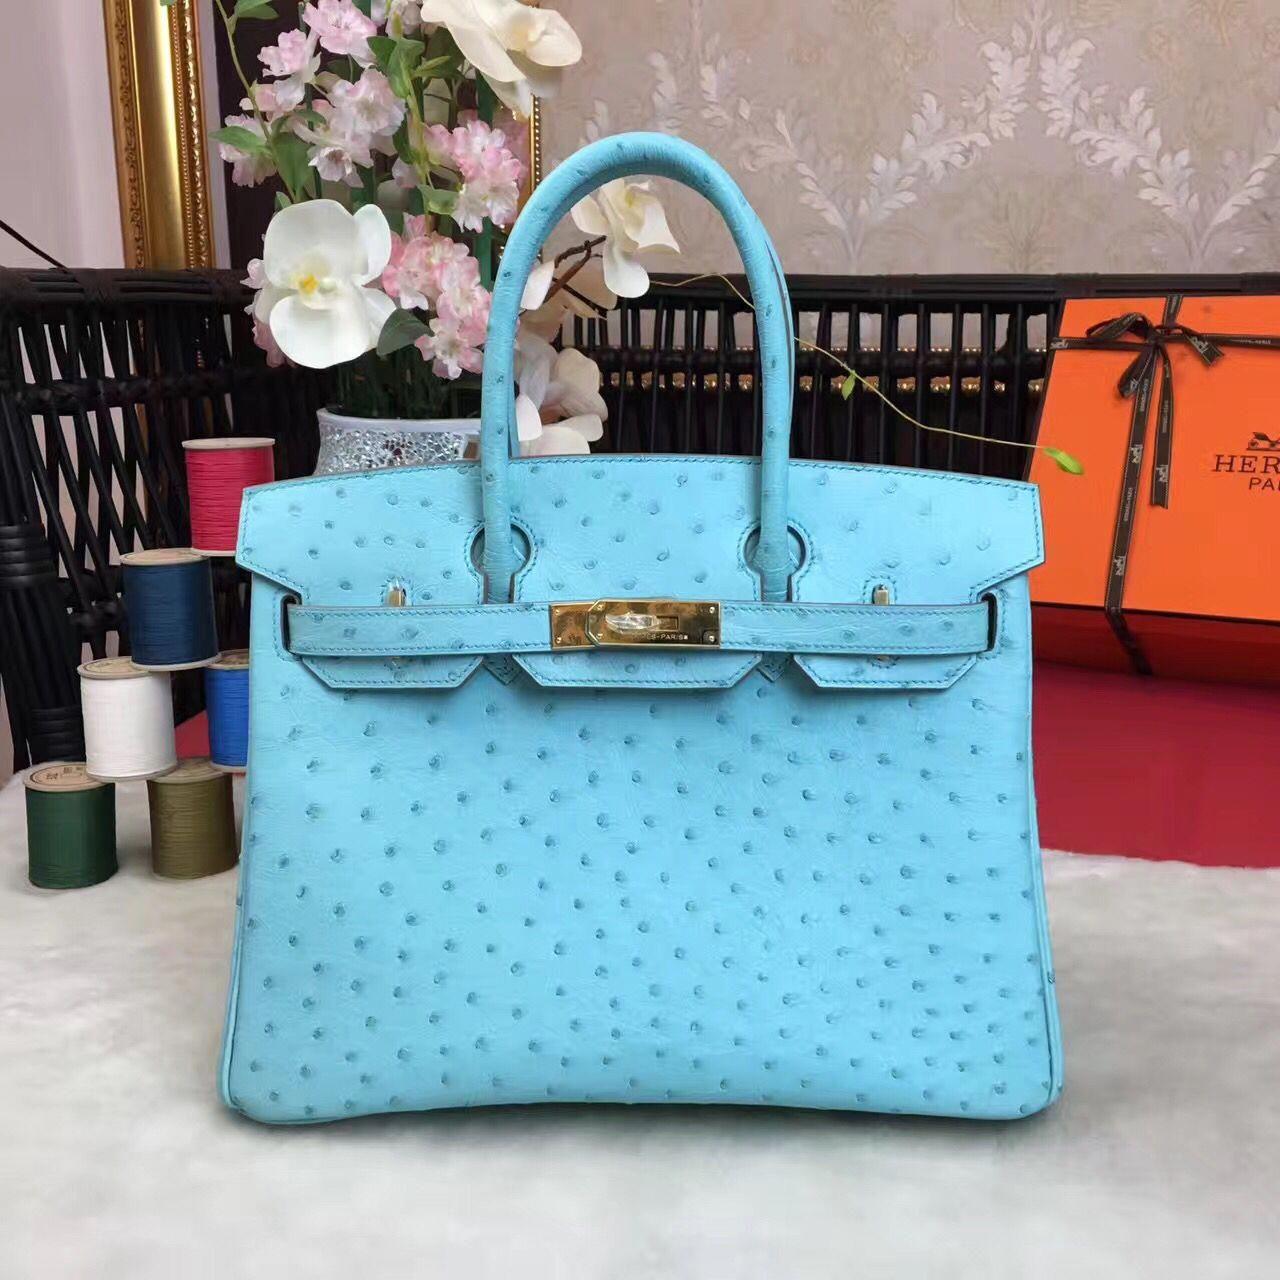 Why Are Hermes Handbags So Expensive Hermeshandbags